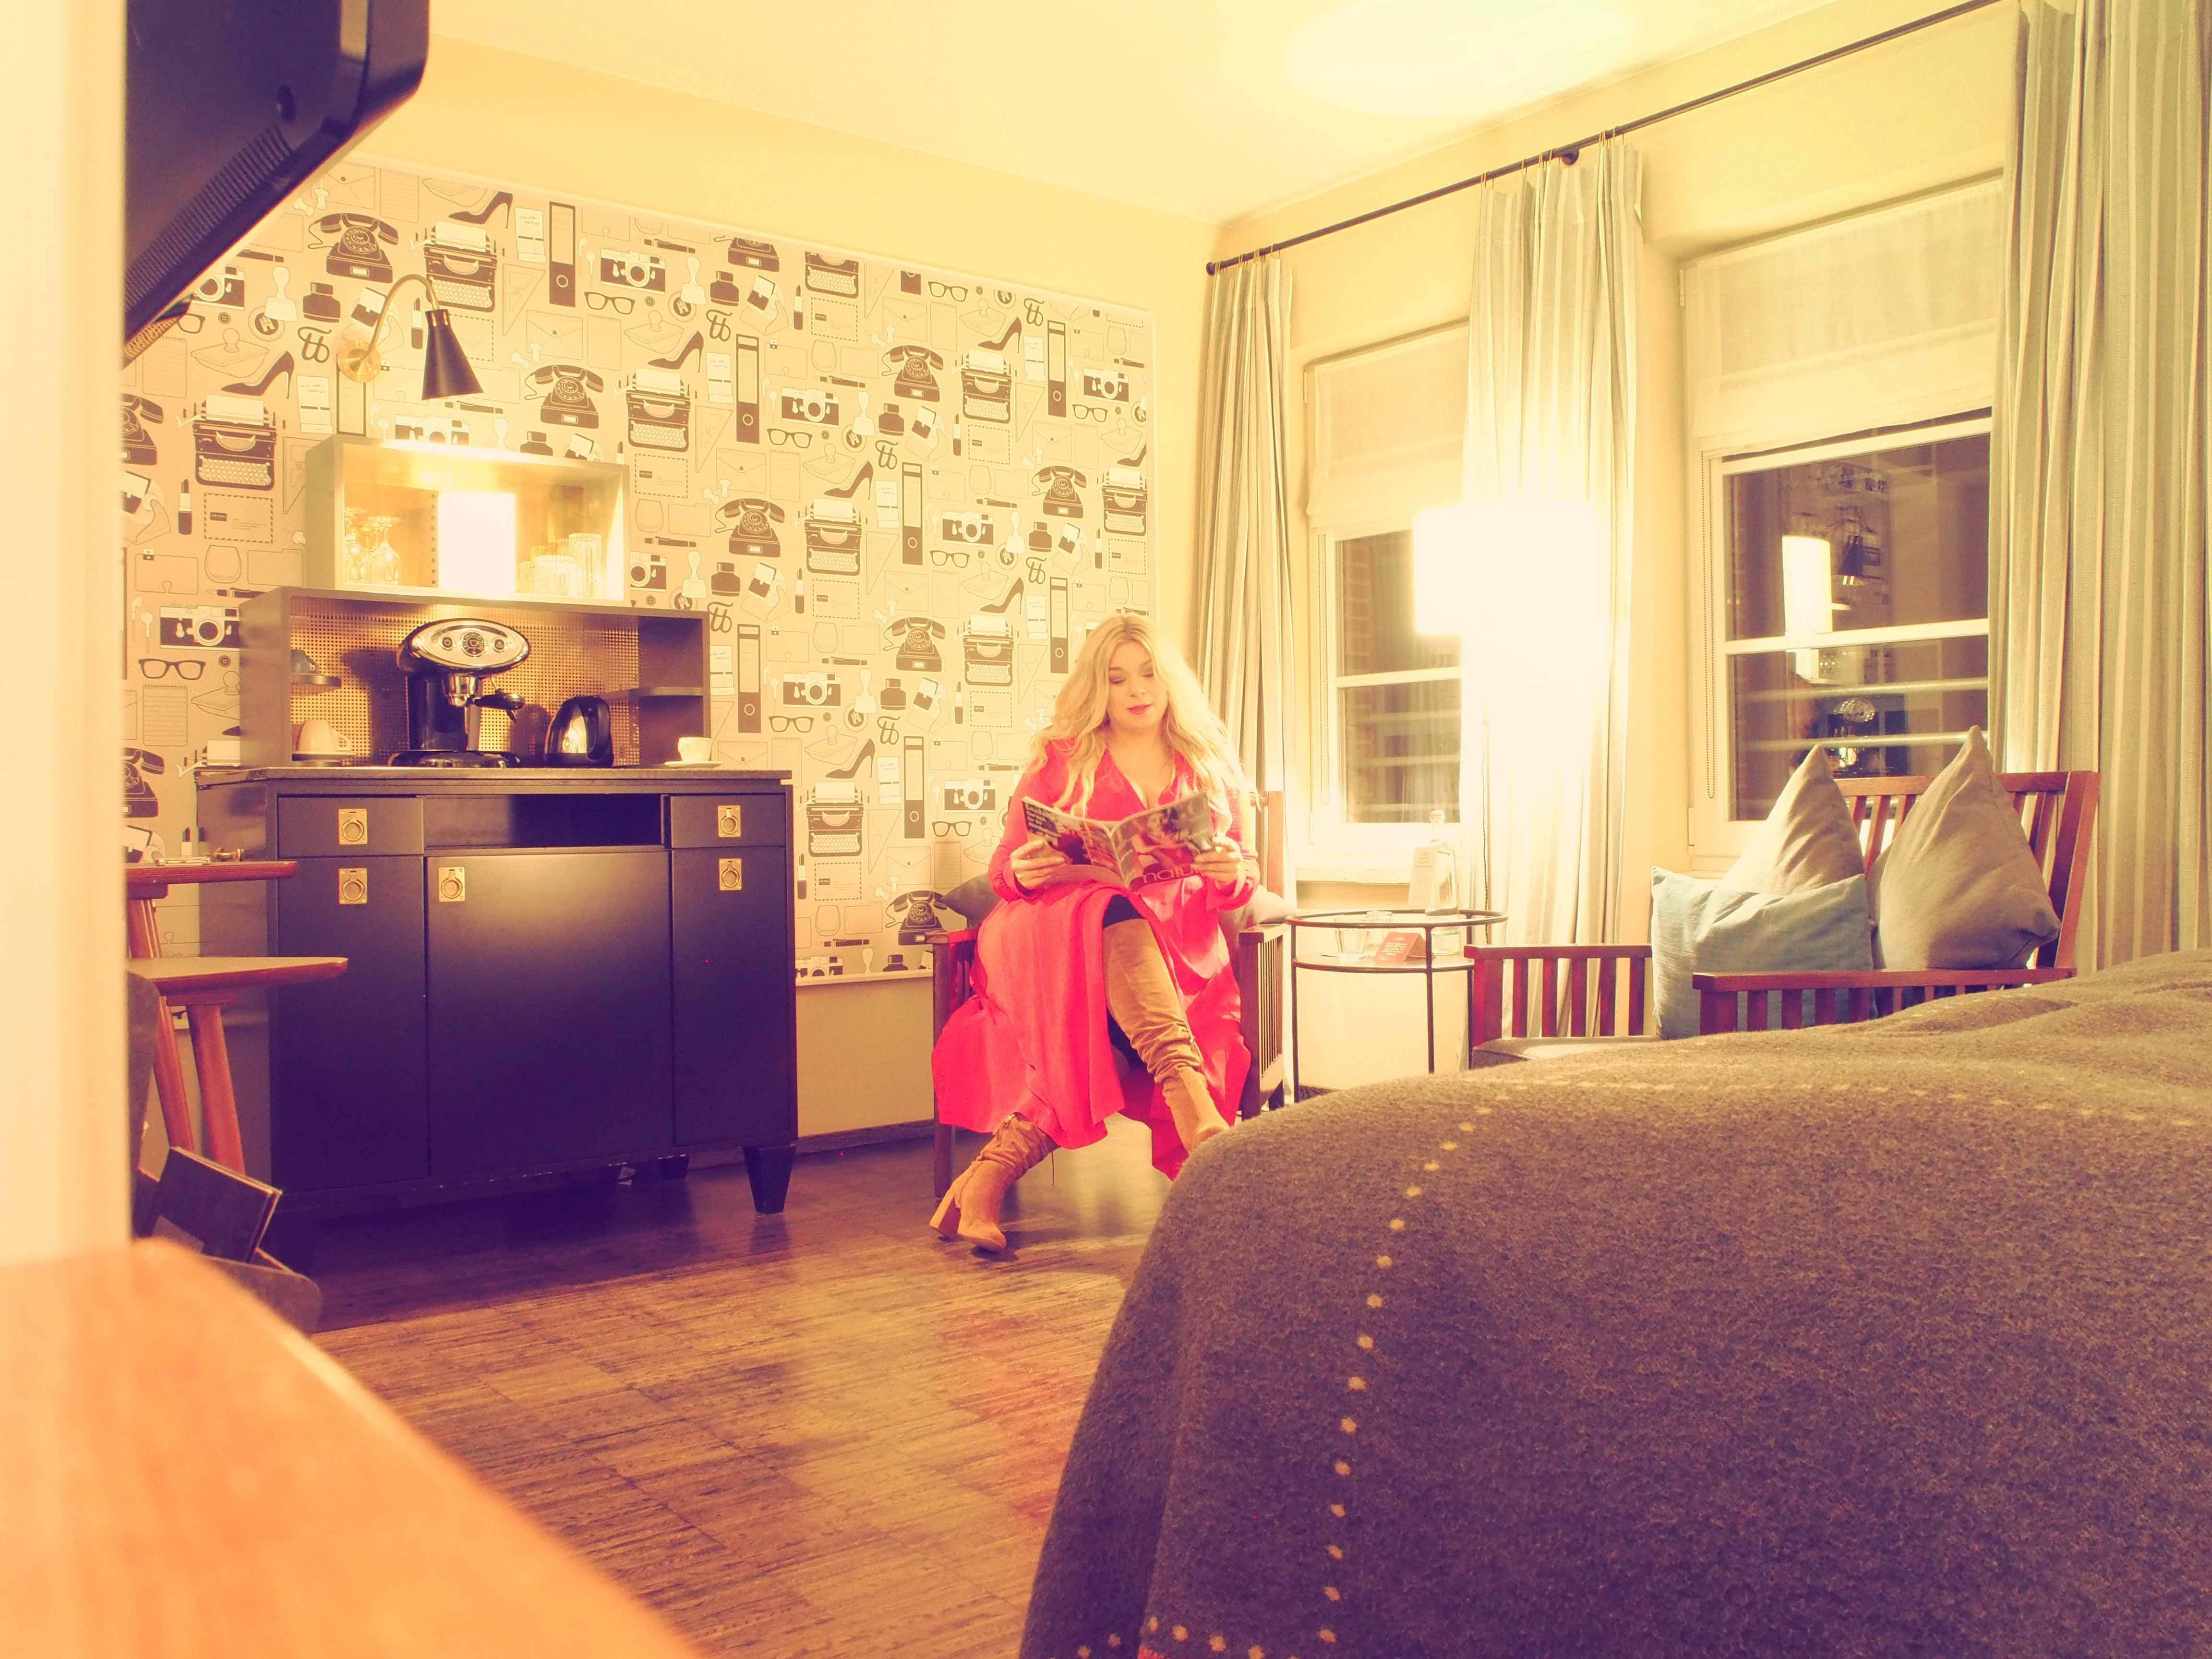 Henrihotel-Megabambi-Caterina-pogorzelski-Fashionblog-Hoteltest